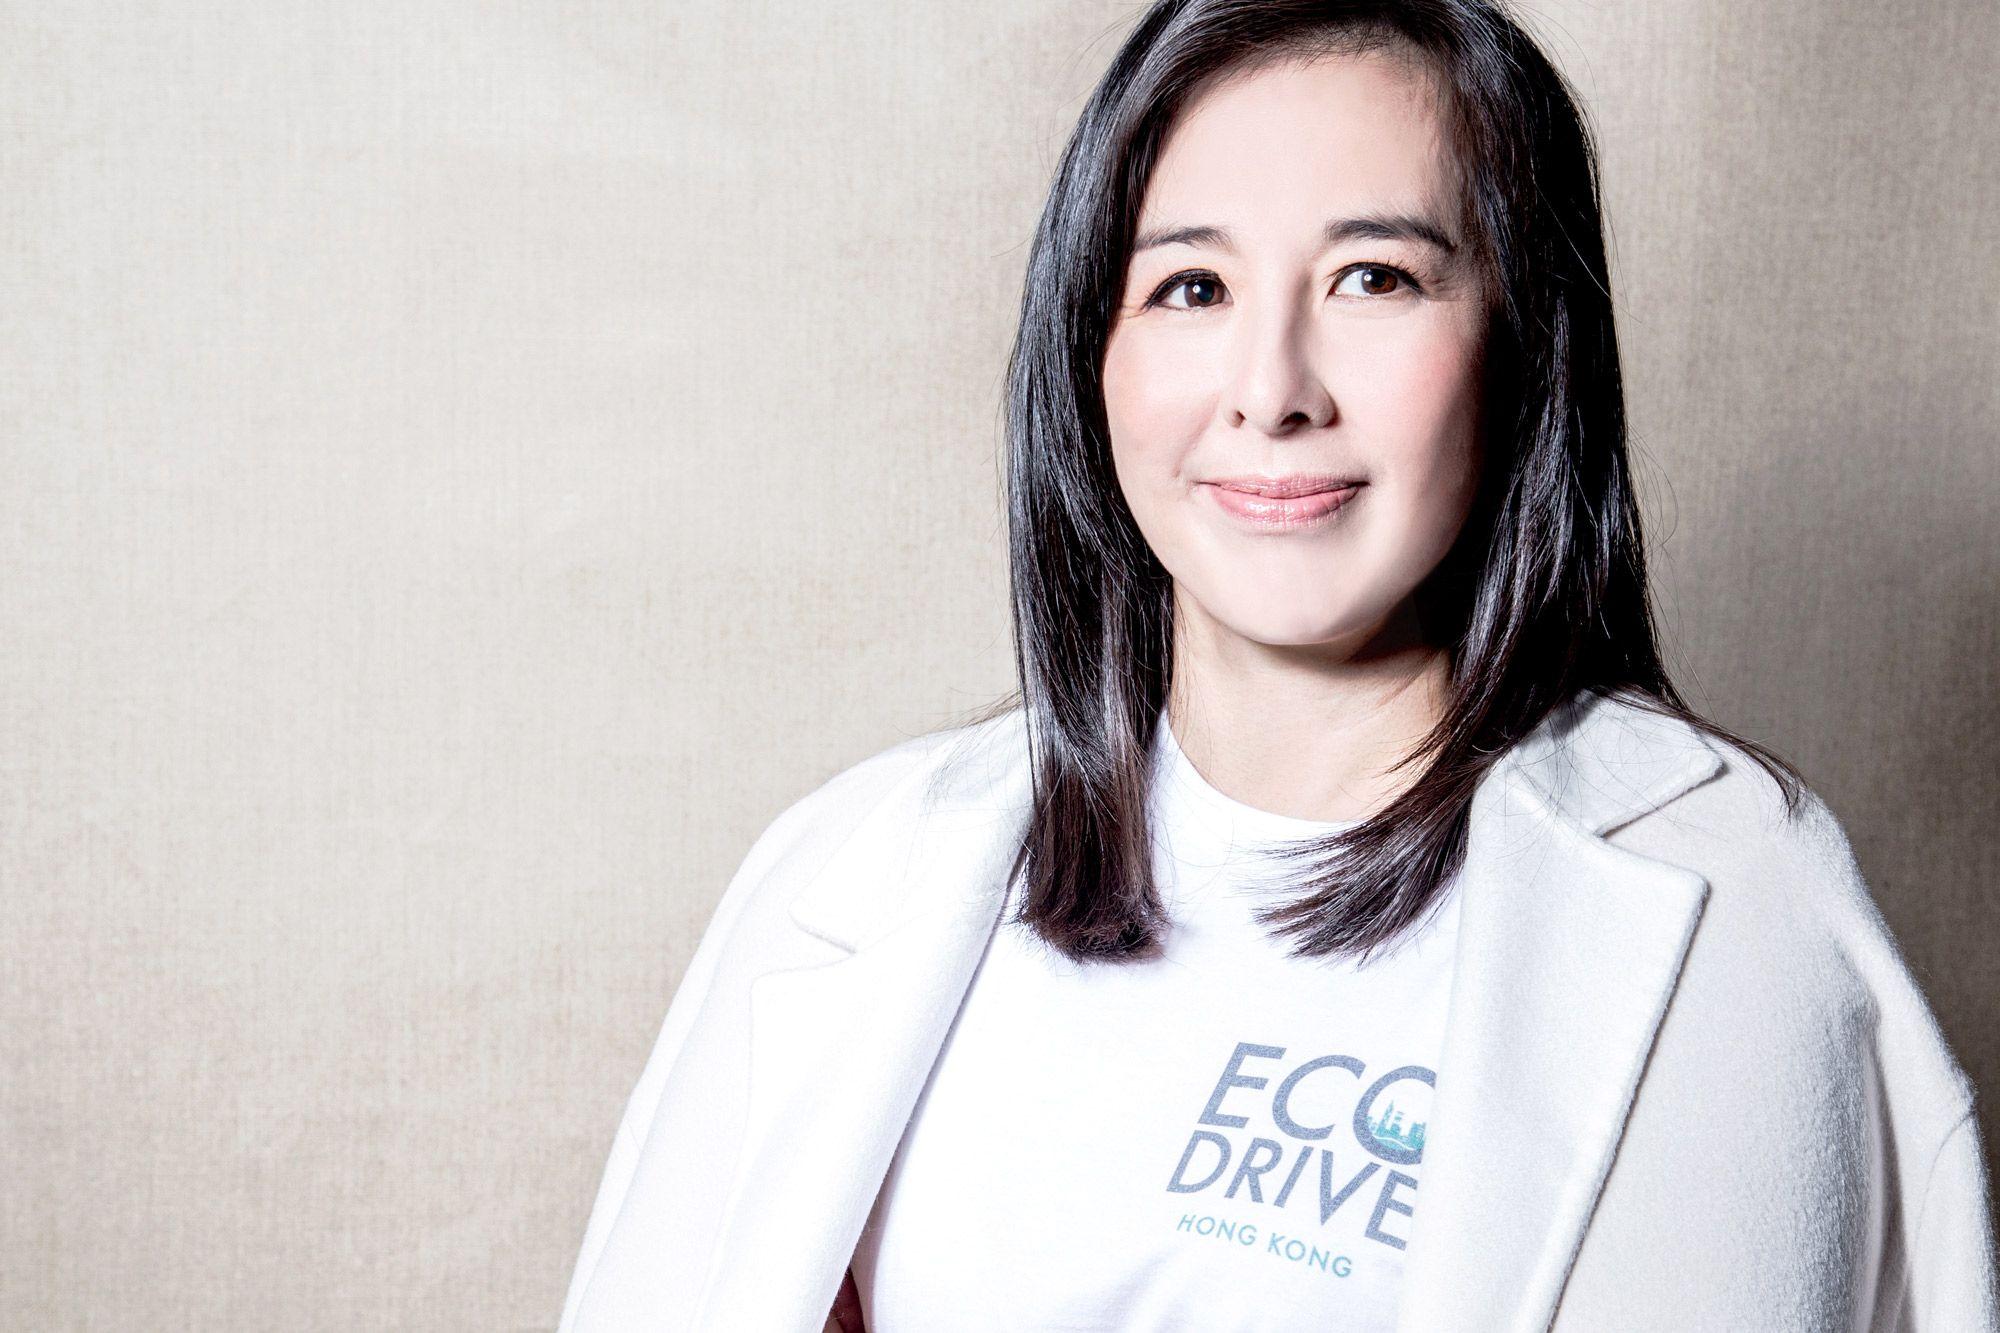 Eco Warriors: Jennifer Wang-Fang of EcoDrive Hong Kong